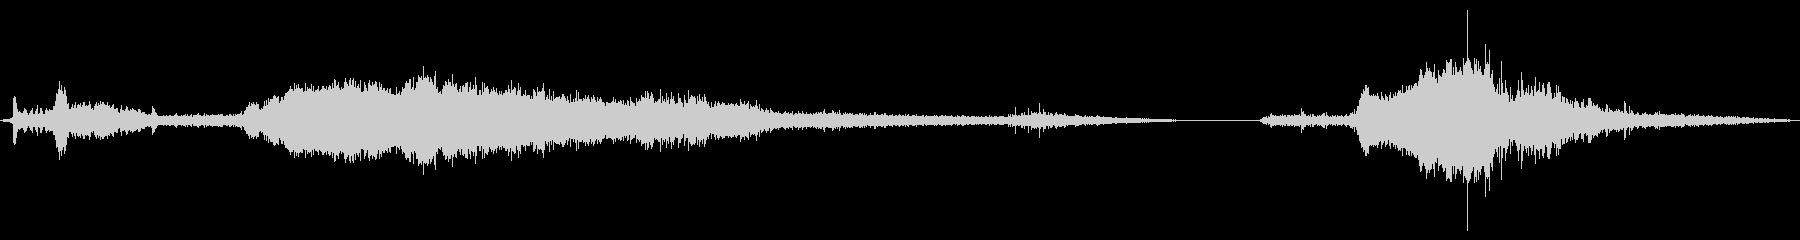 MAZDA 626、1988、ウェ...の未再生の波形